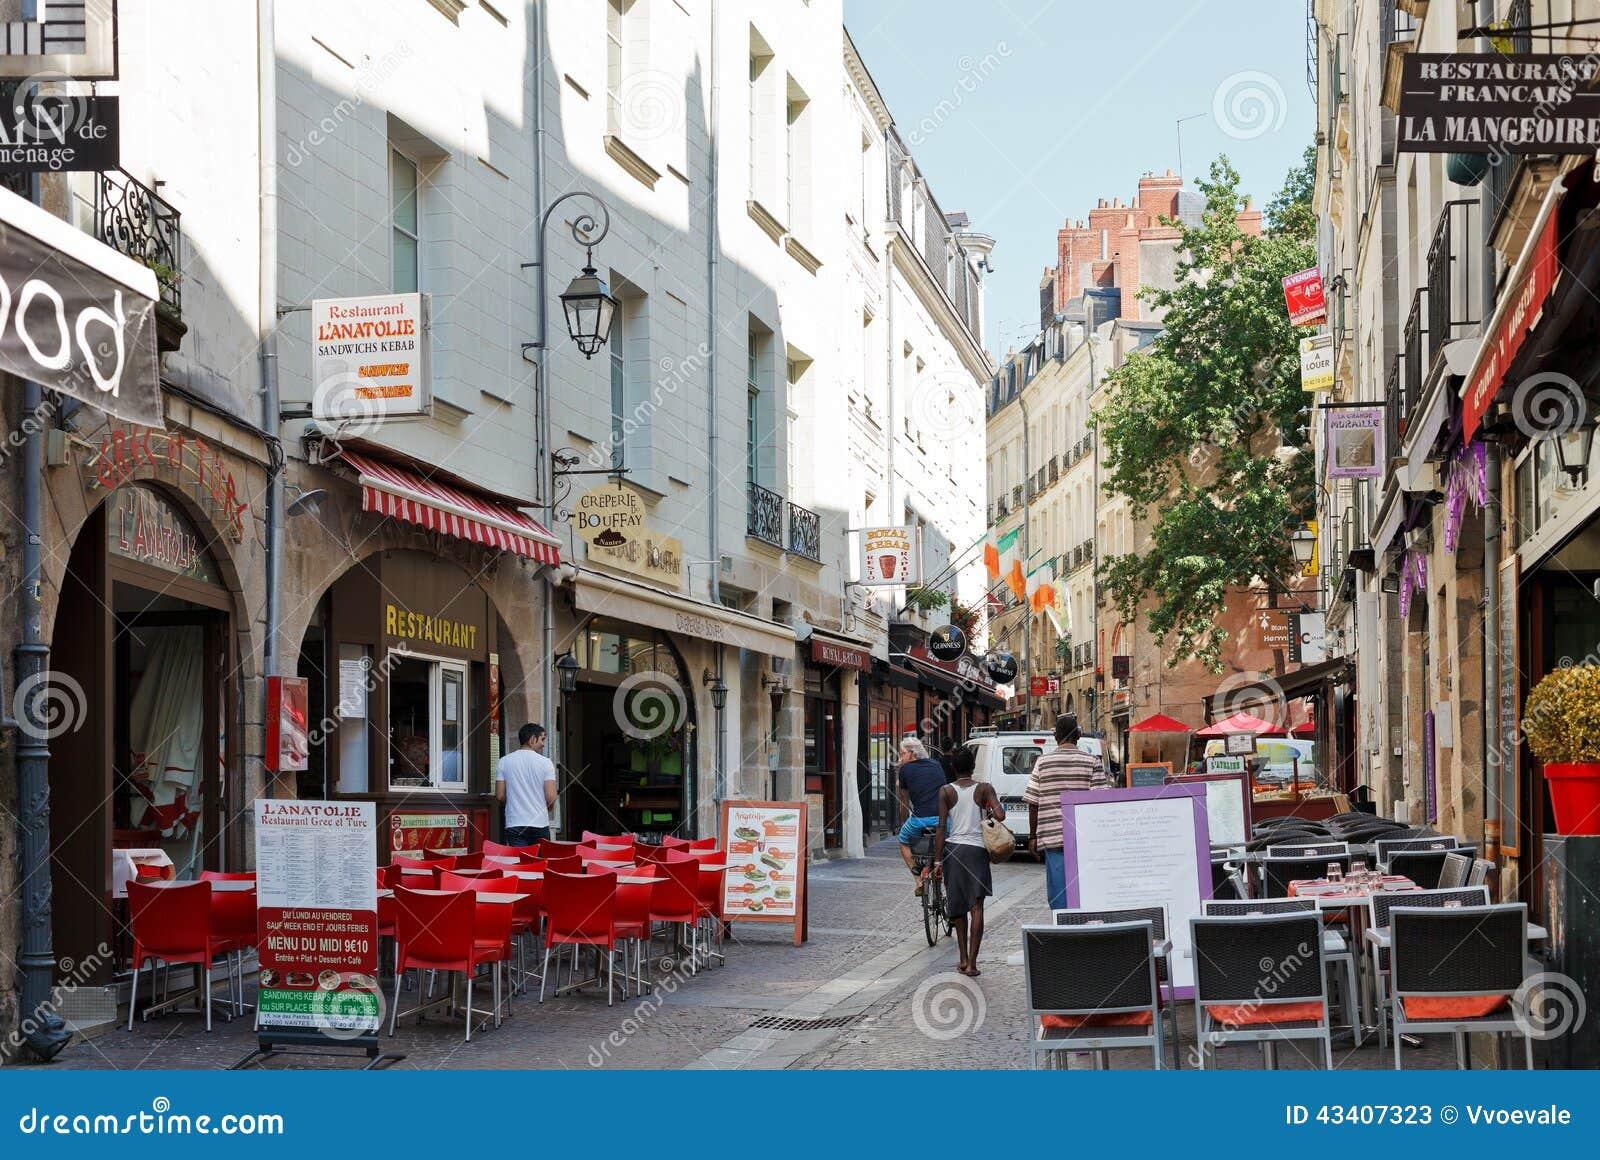 rue rue de la baclerie nantes france photo stock ditorial image 43407323. Black Bedroom Furniture Sets. Home Design Ideas